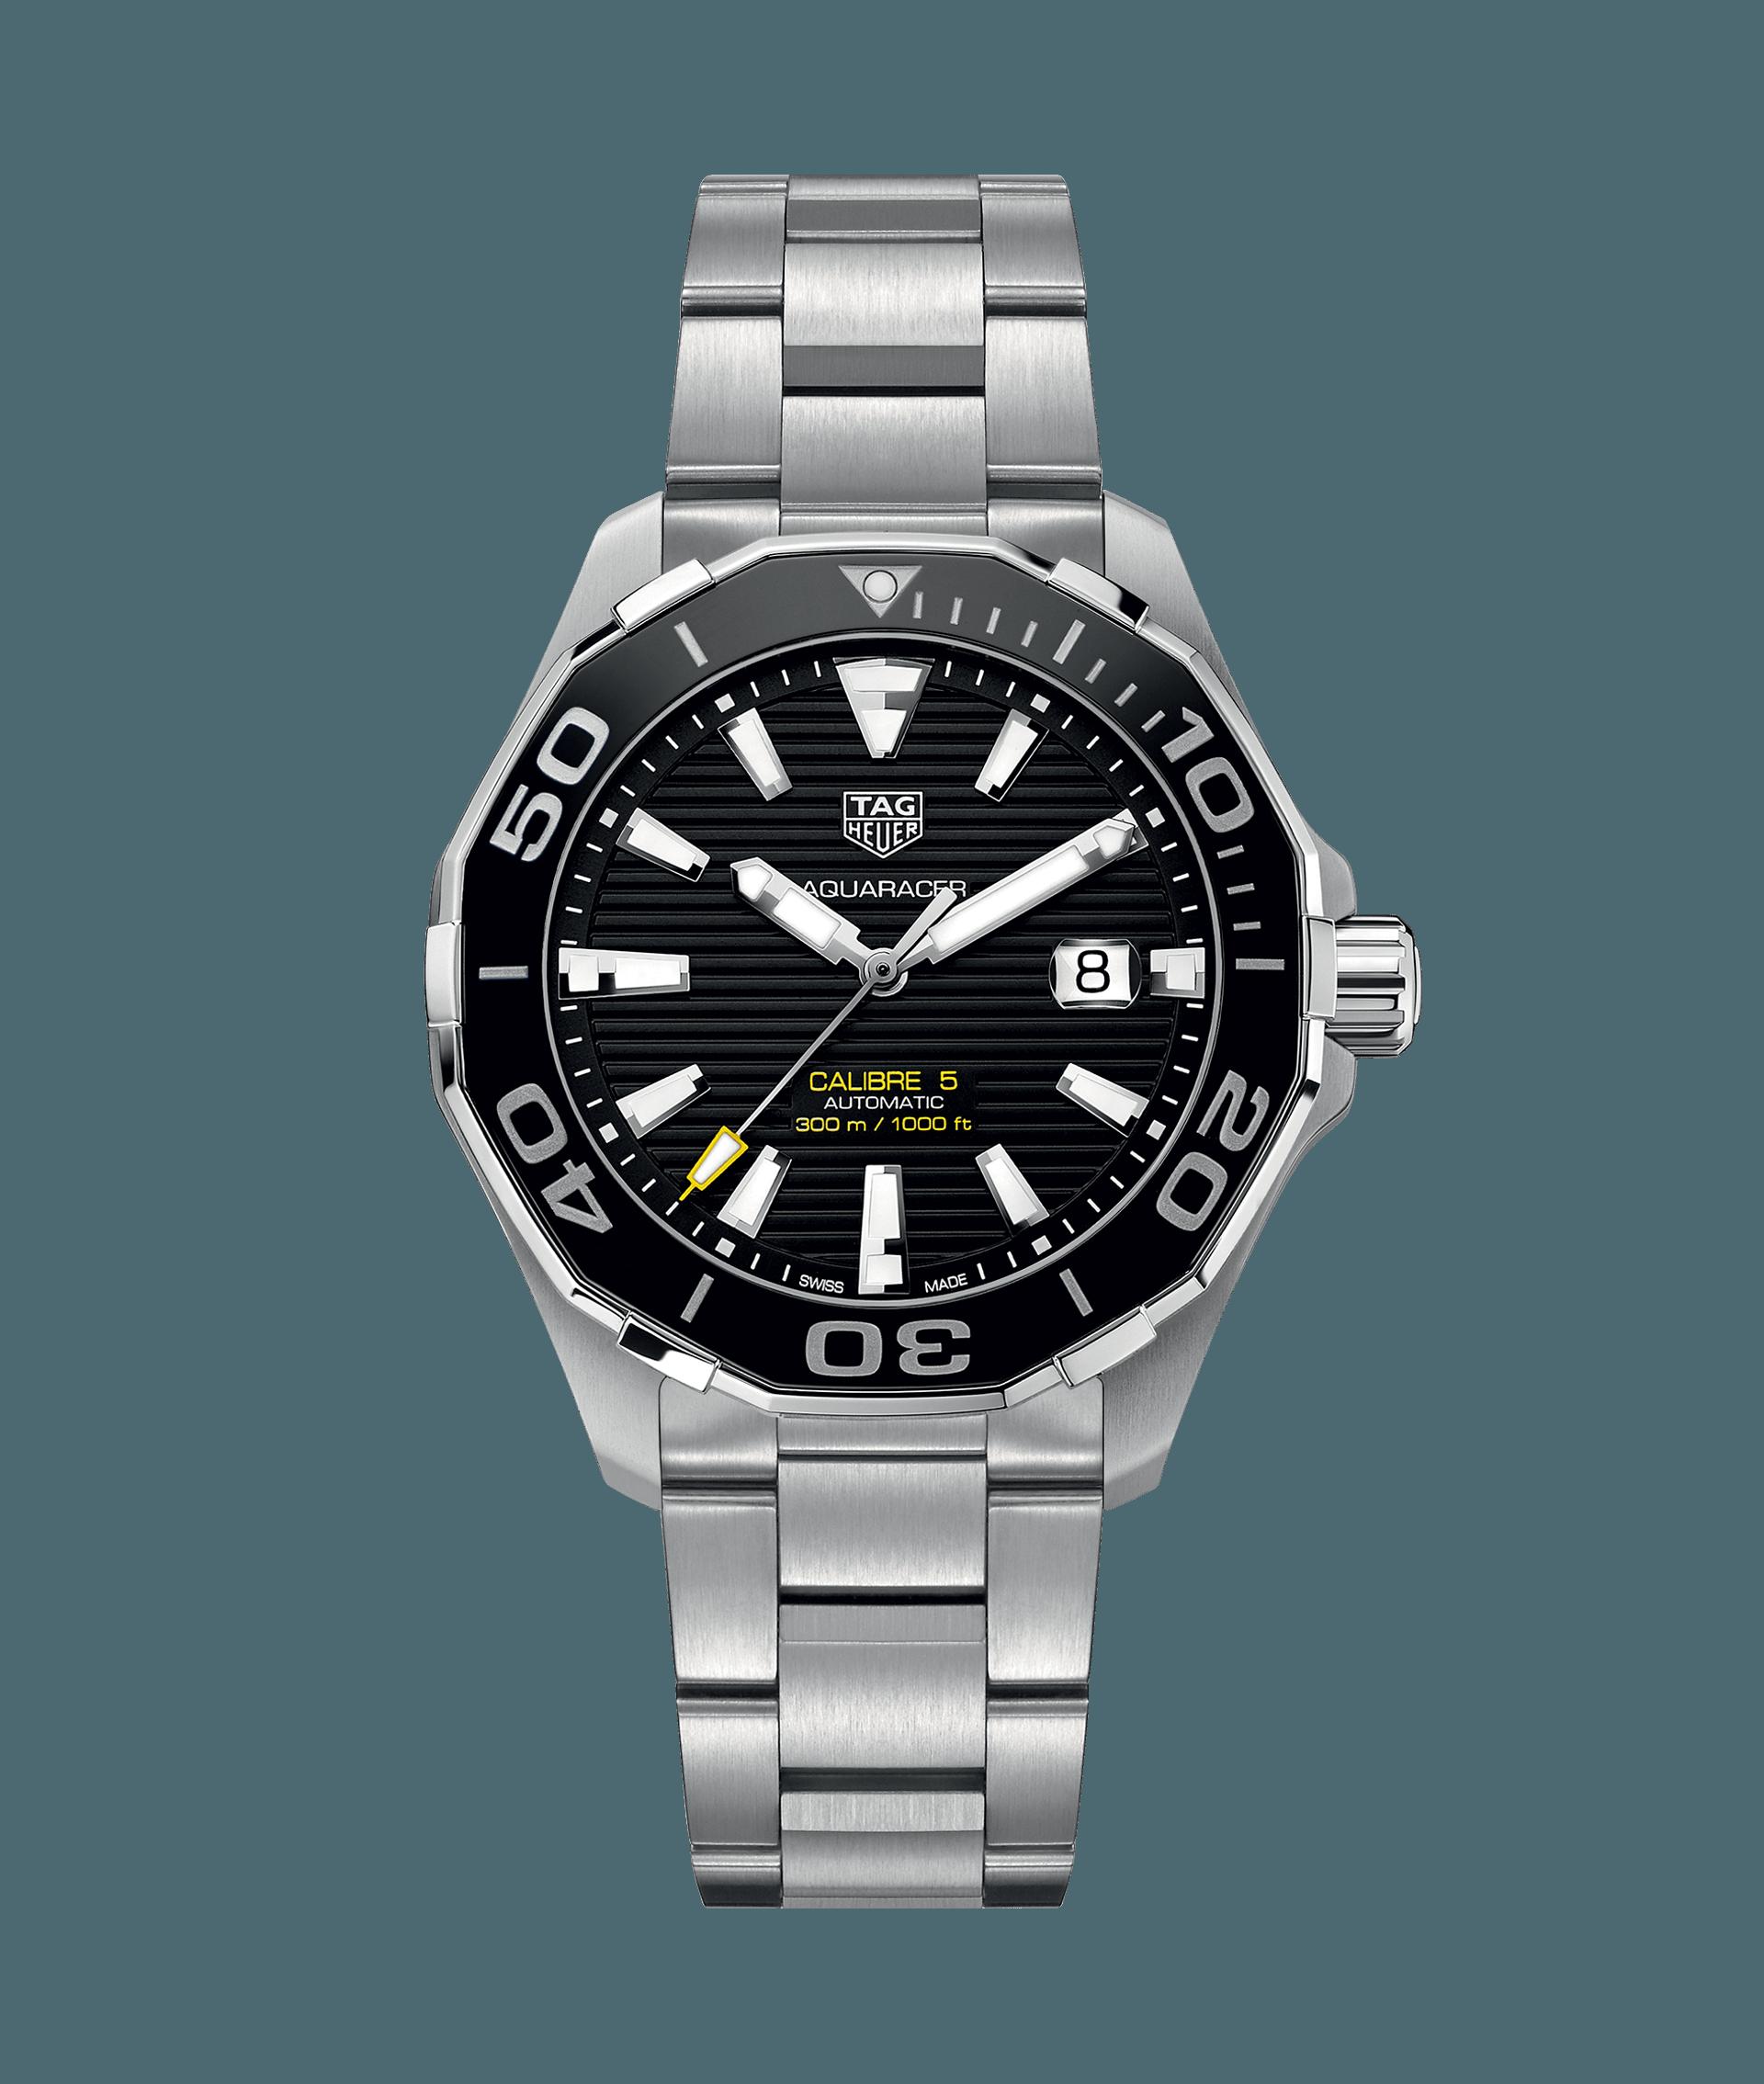 7b1d096cc9e Aquaracer Calibre 5 Automatic #watch 300 M - 43 mm Ceramic Bezel  WAY201A.BA0927 TAG Heuer watch price